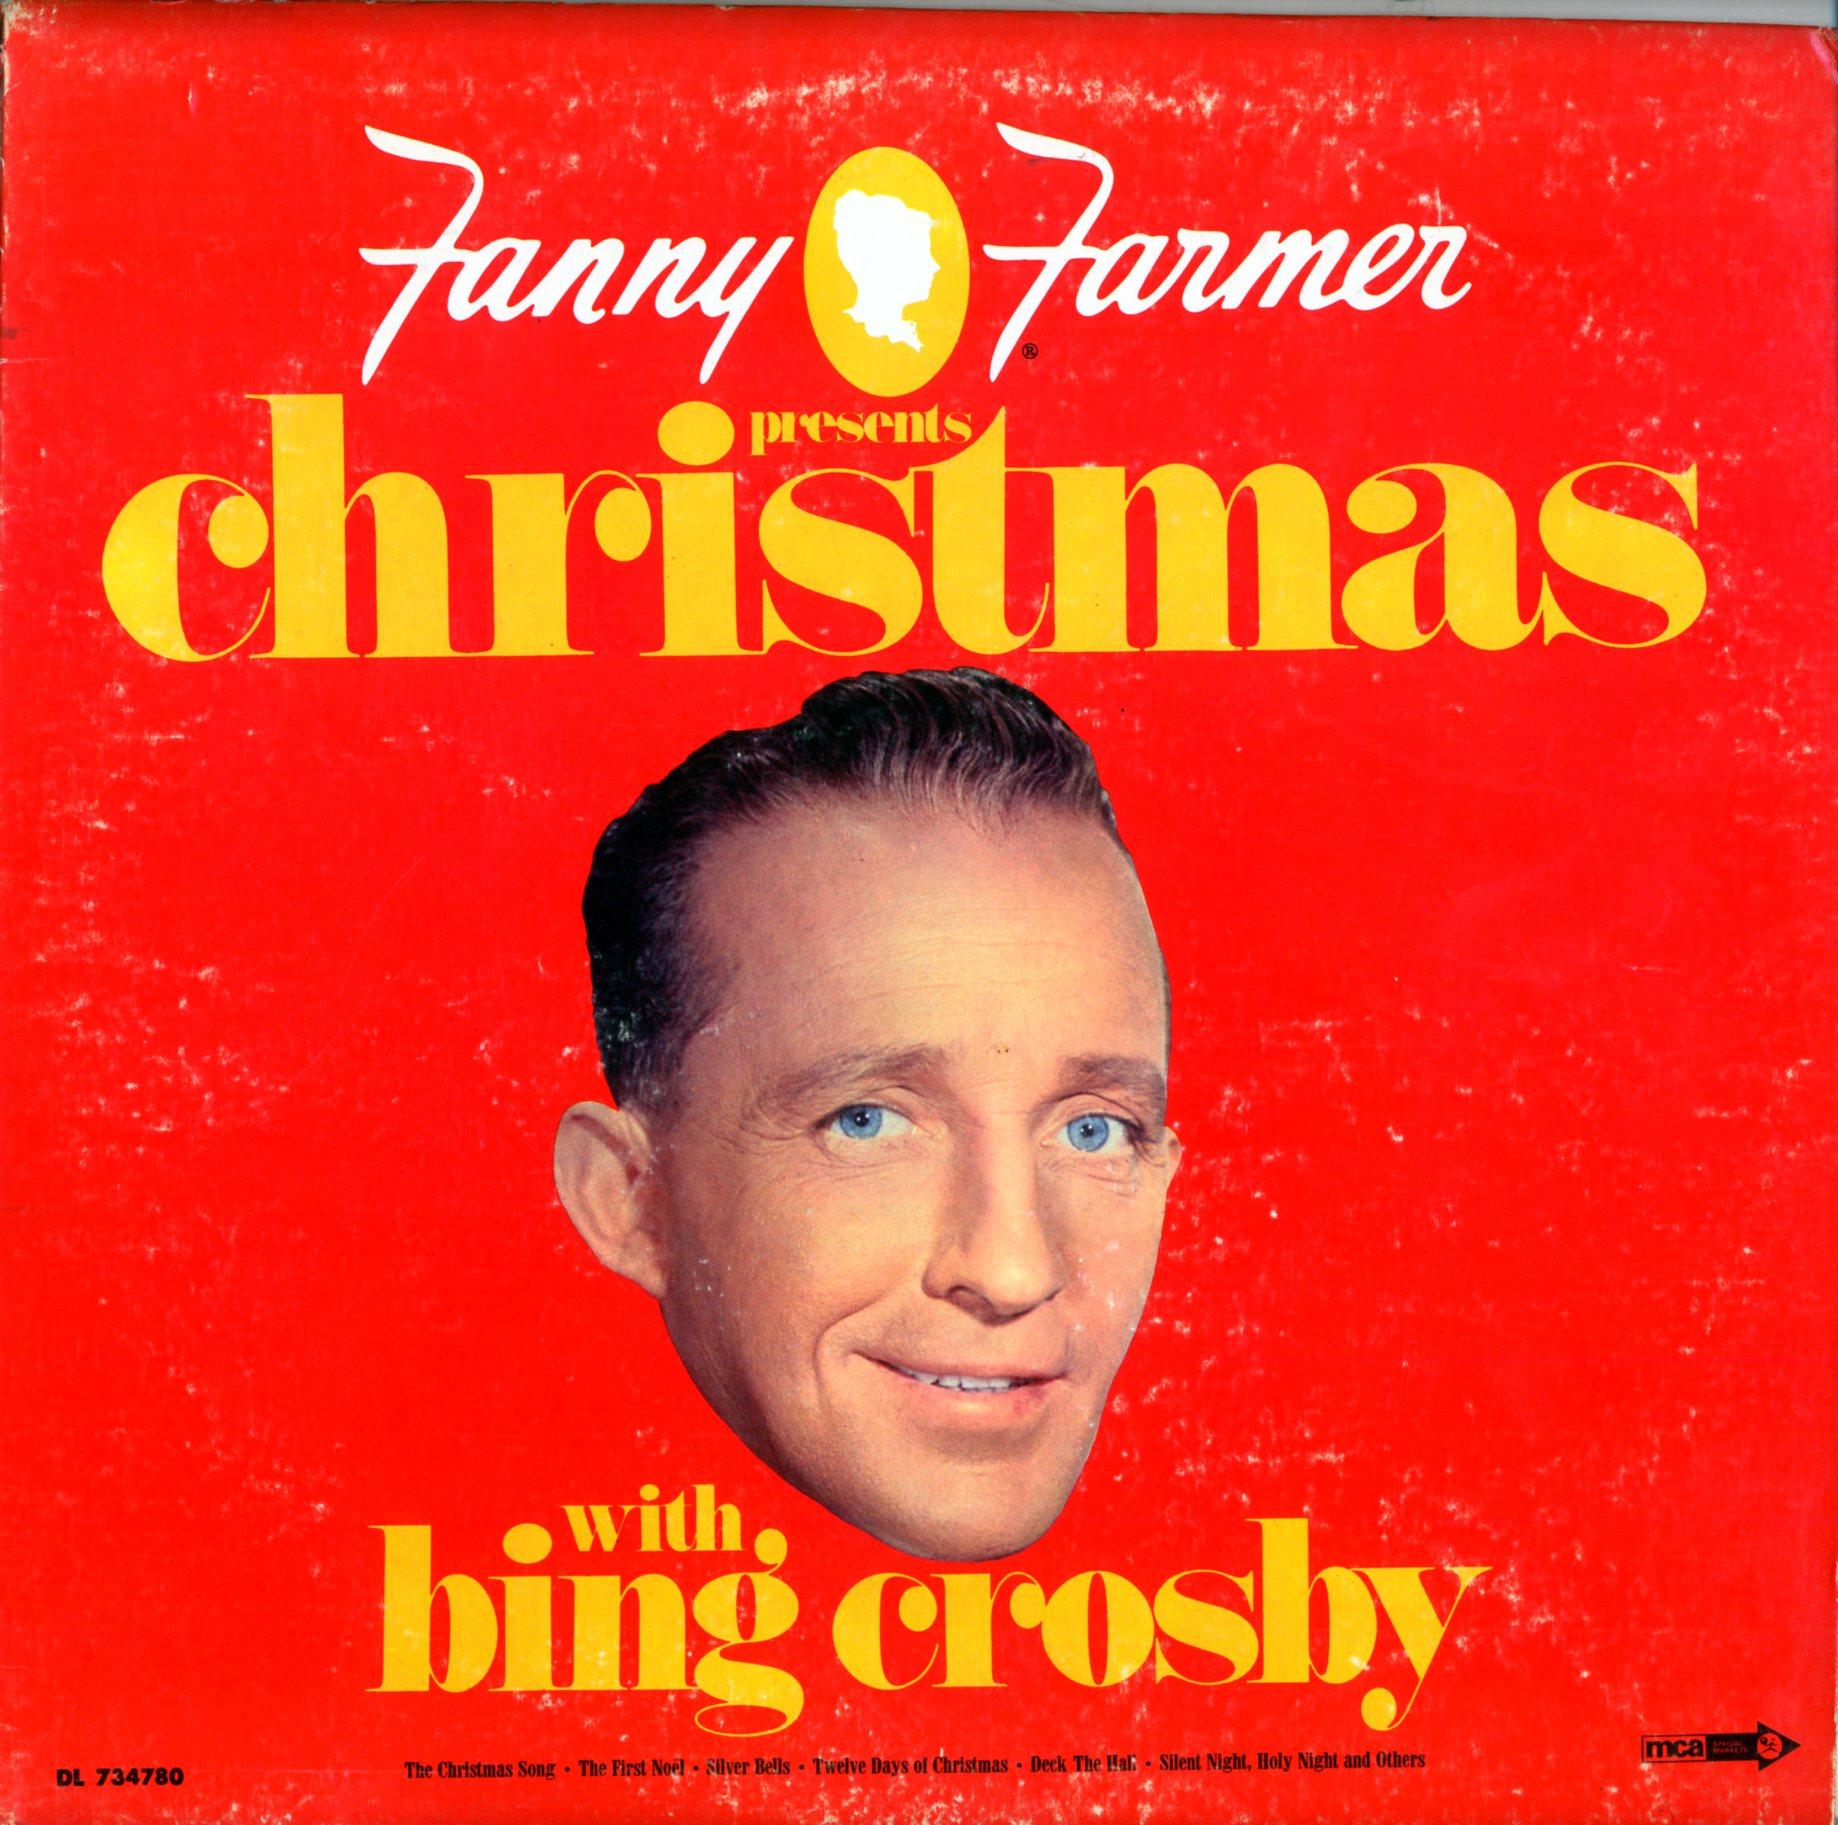 CD - Crosby, Bing - Christmas With by Fanny Farmer